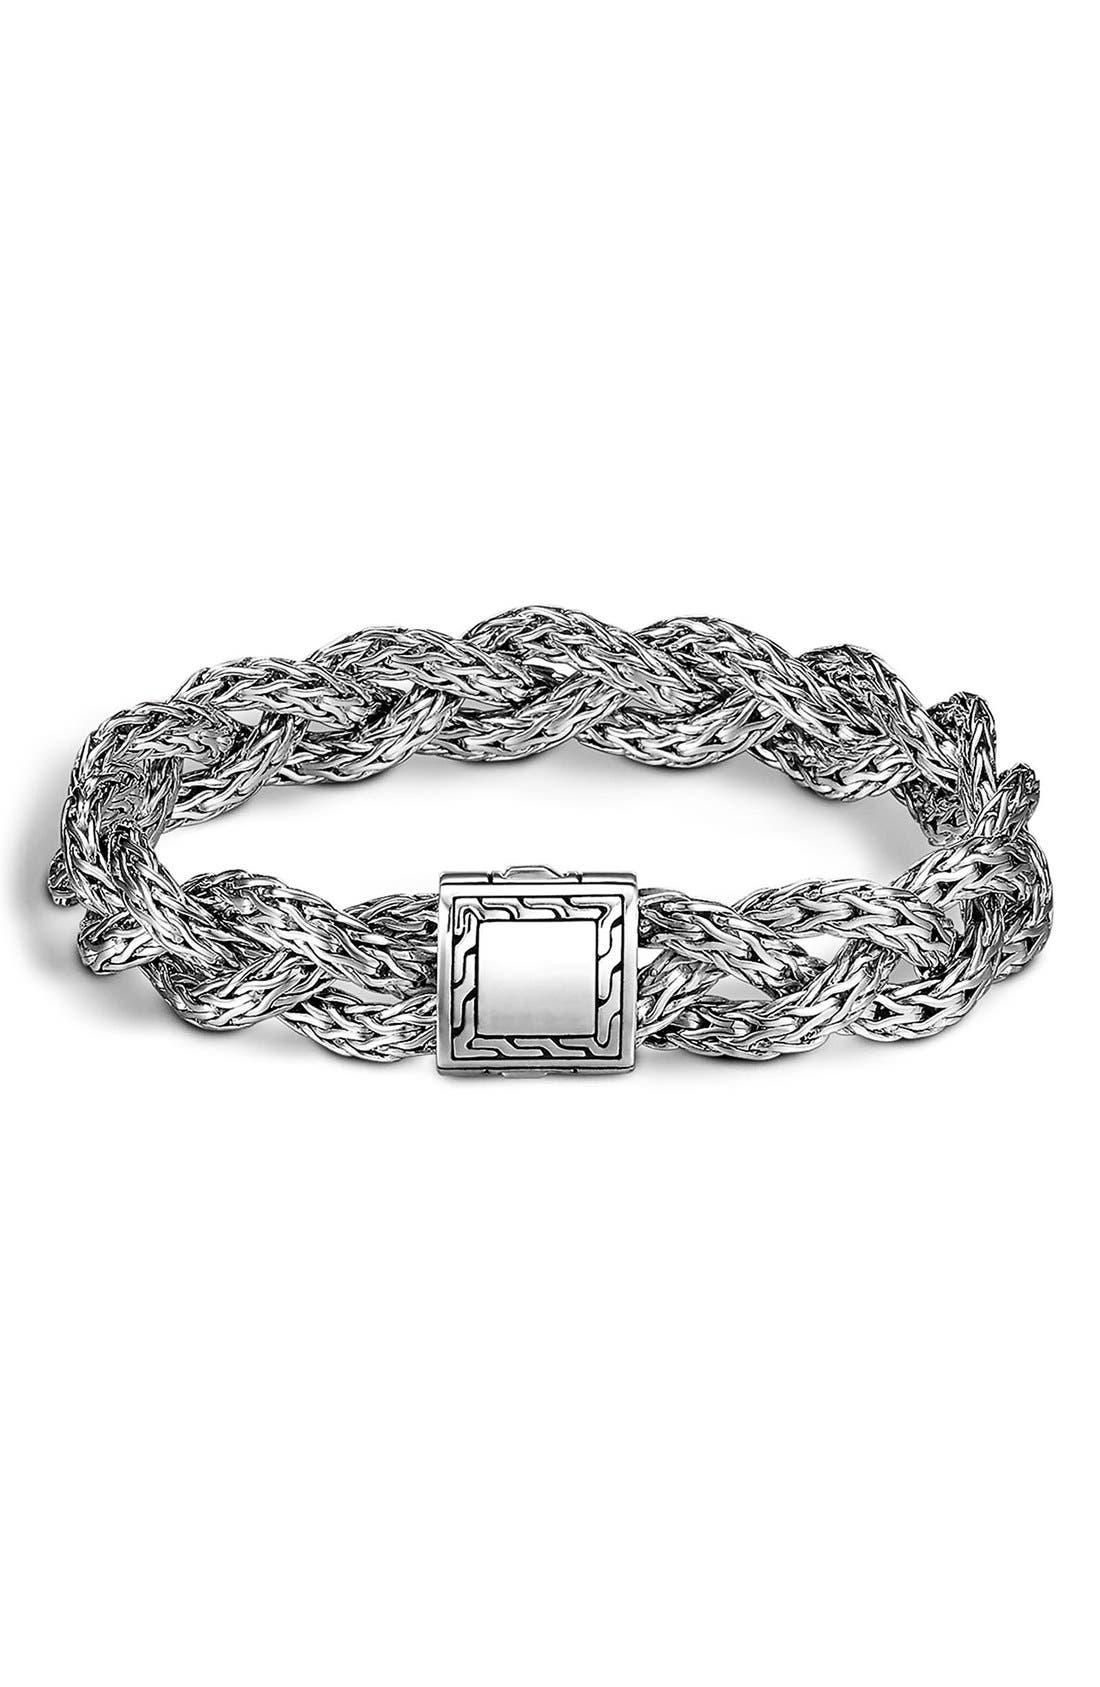 Main Image - John Hardy 'Classic Chain' Small Braided Bracelet